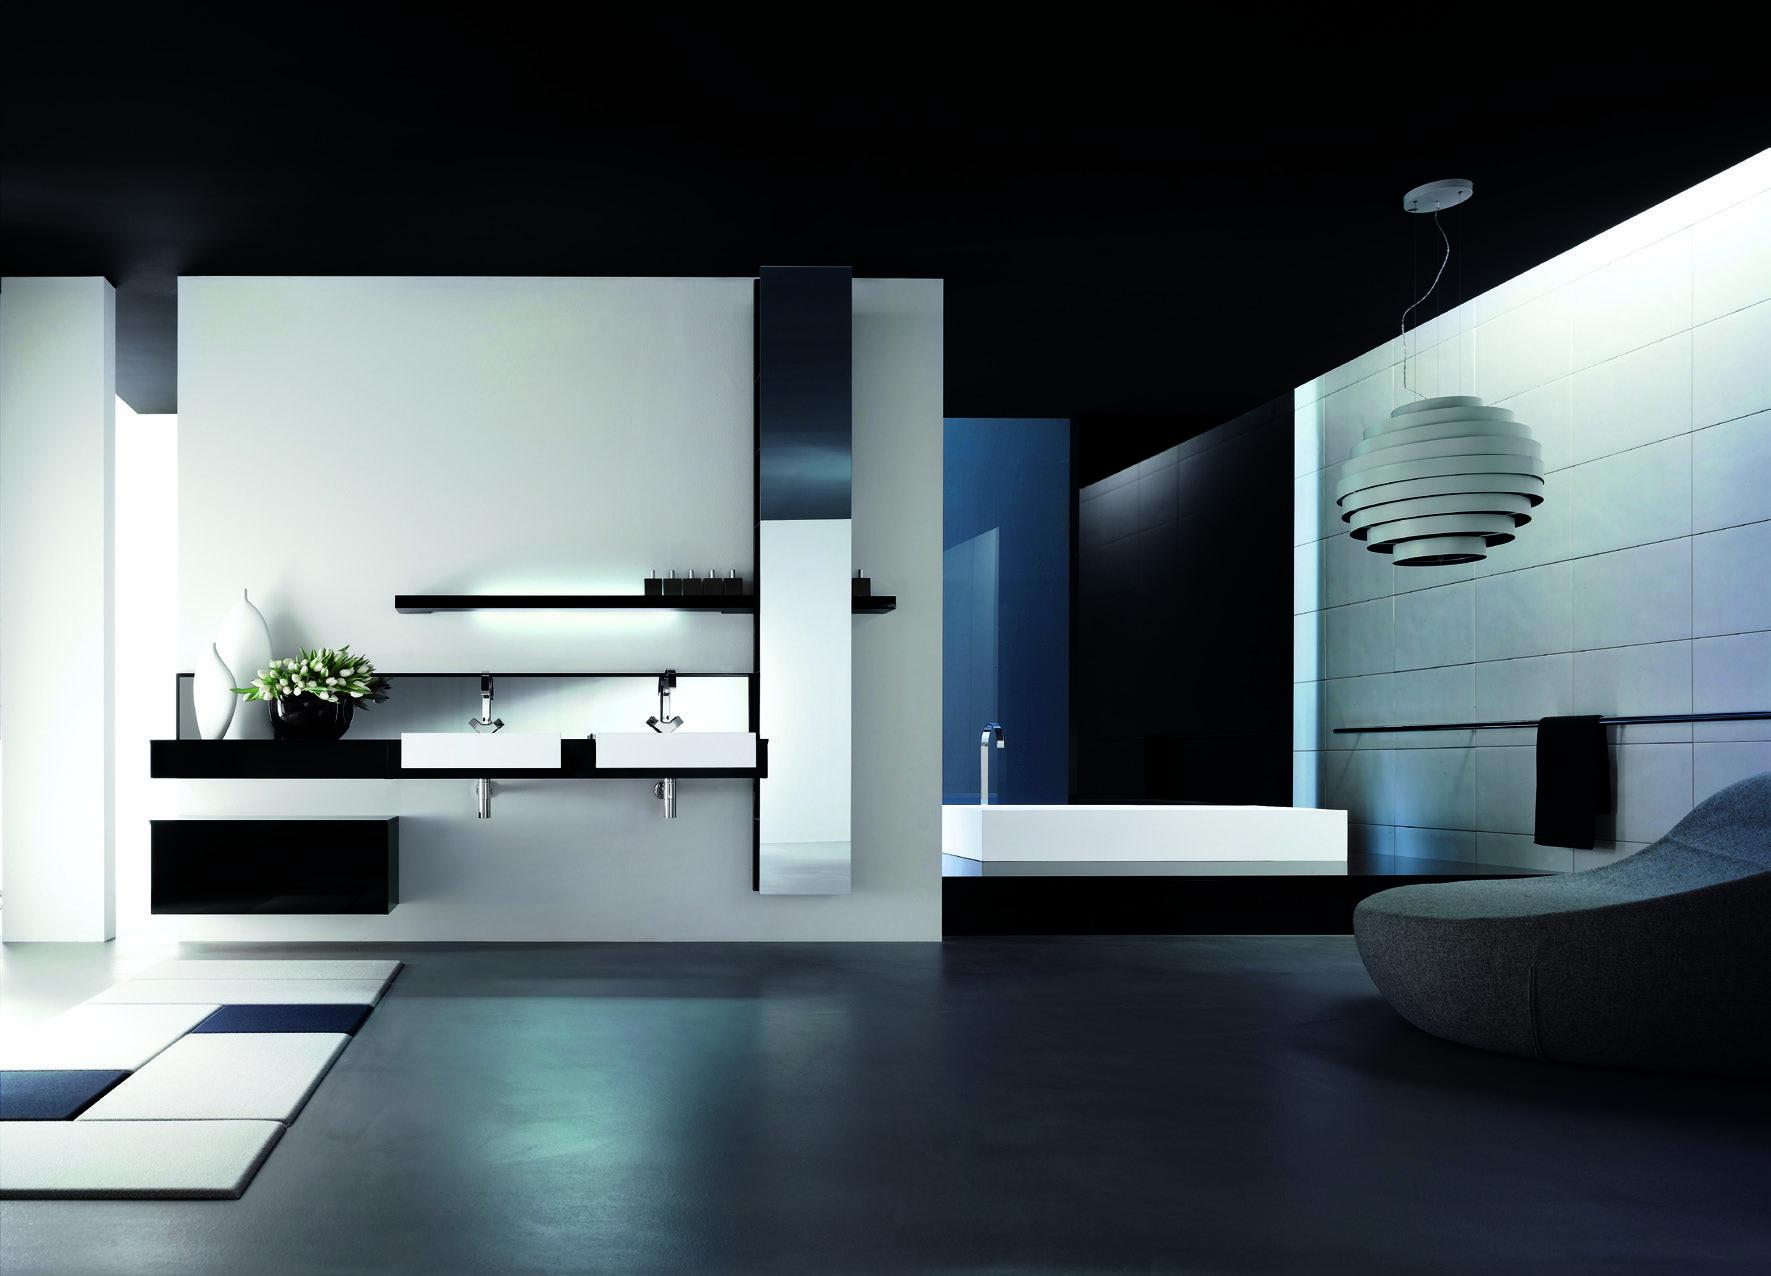 KUBIK 53 | Ambient Bathrooms | BATHING BLISS | Pinterest | Bathroom ...